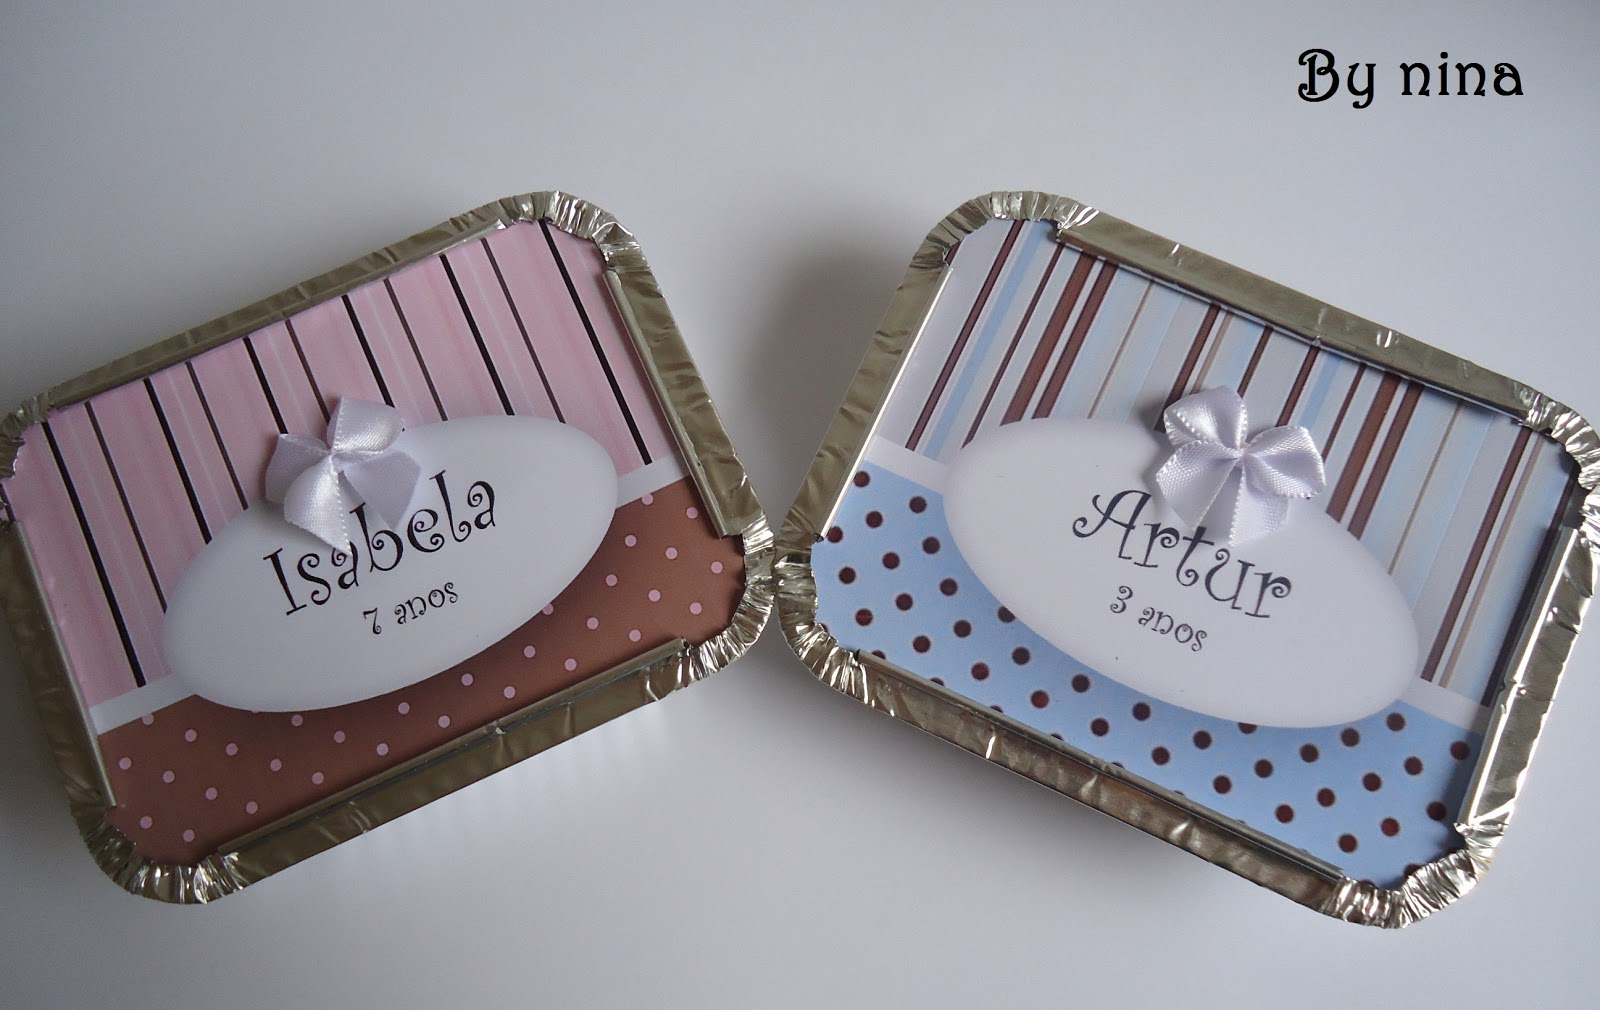 Aparador Suspenso Ikea ~ Nina Ateli u00ea Lembrancinhas Personalizadas em Uberl u00e2ndia